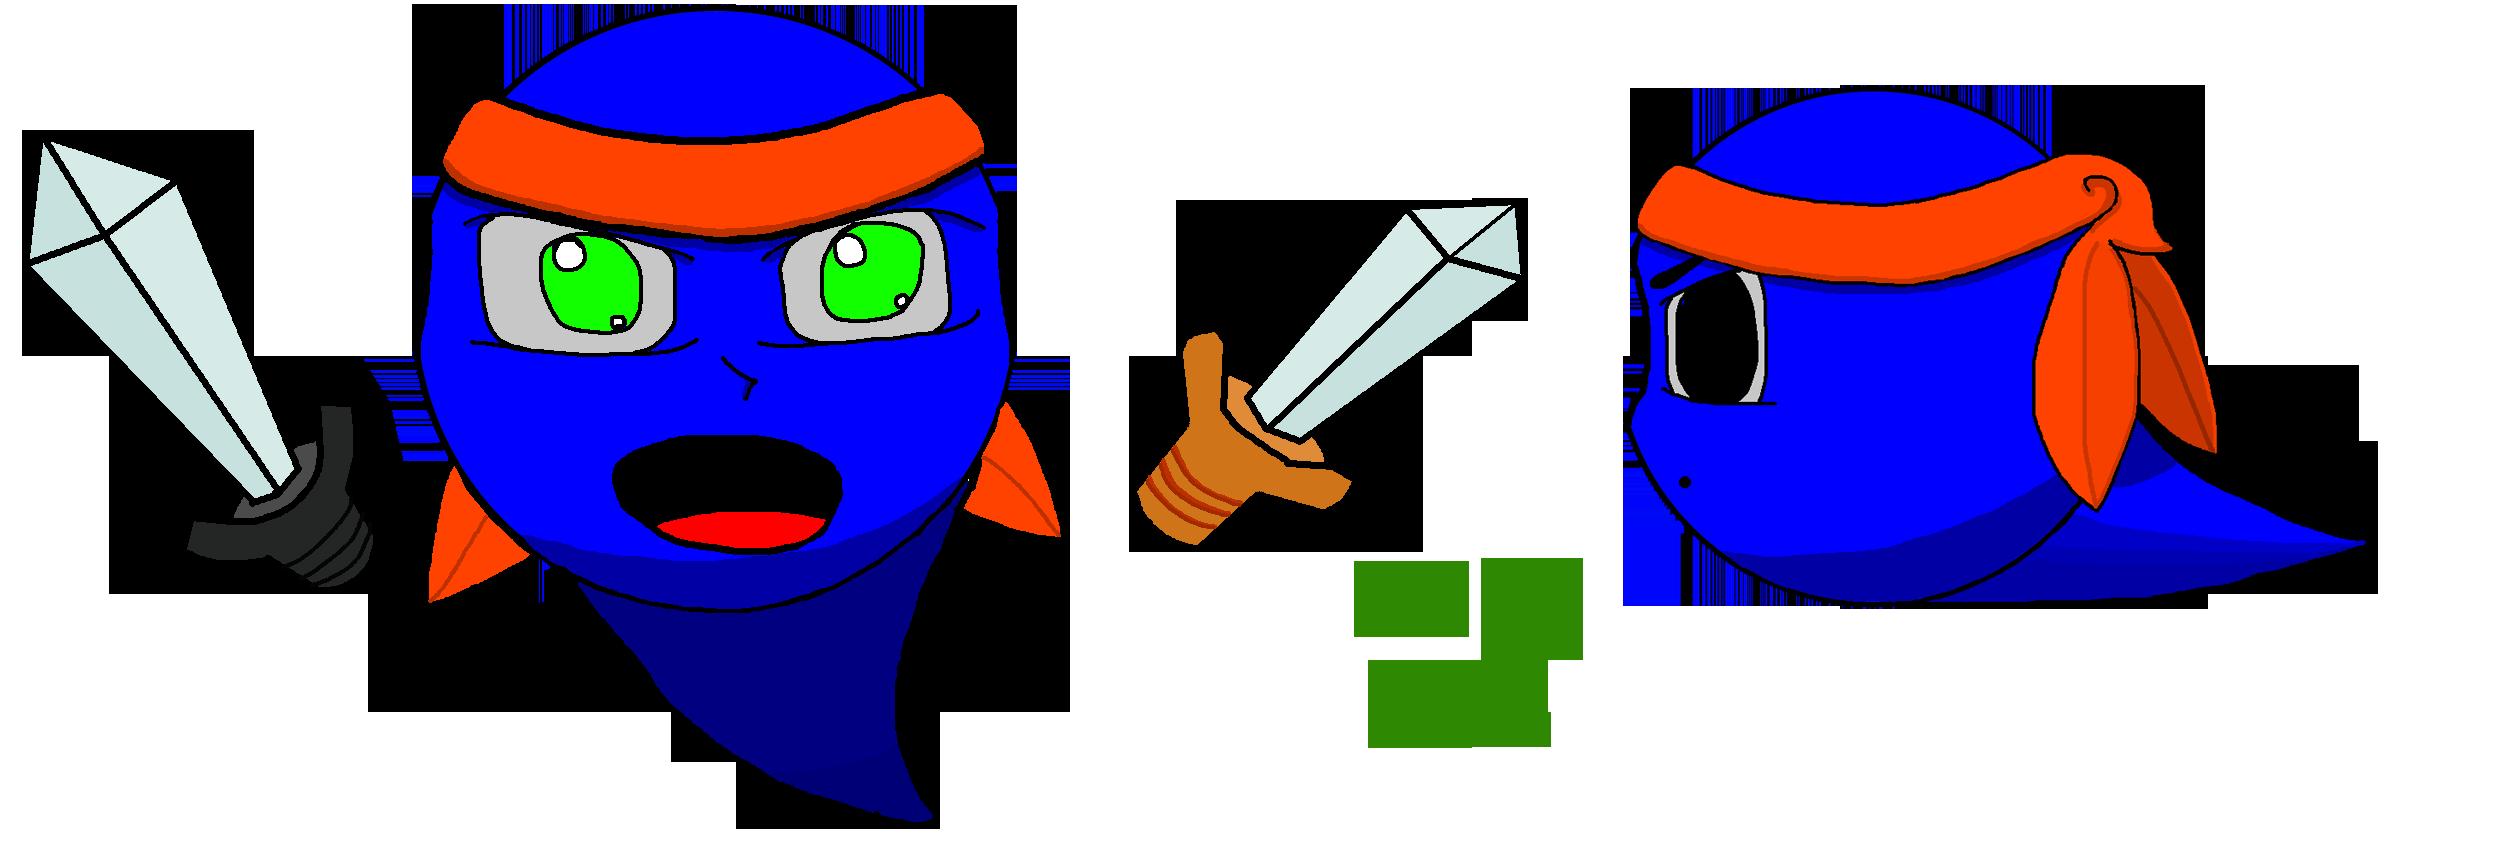 feiby04